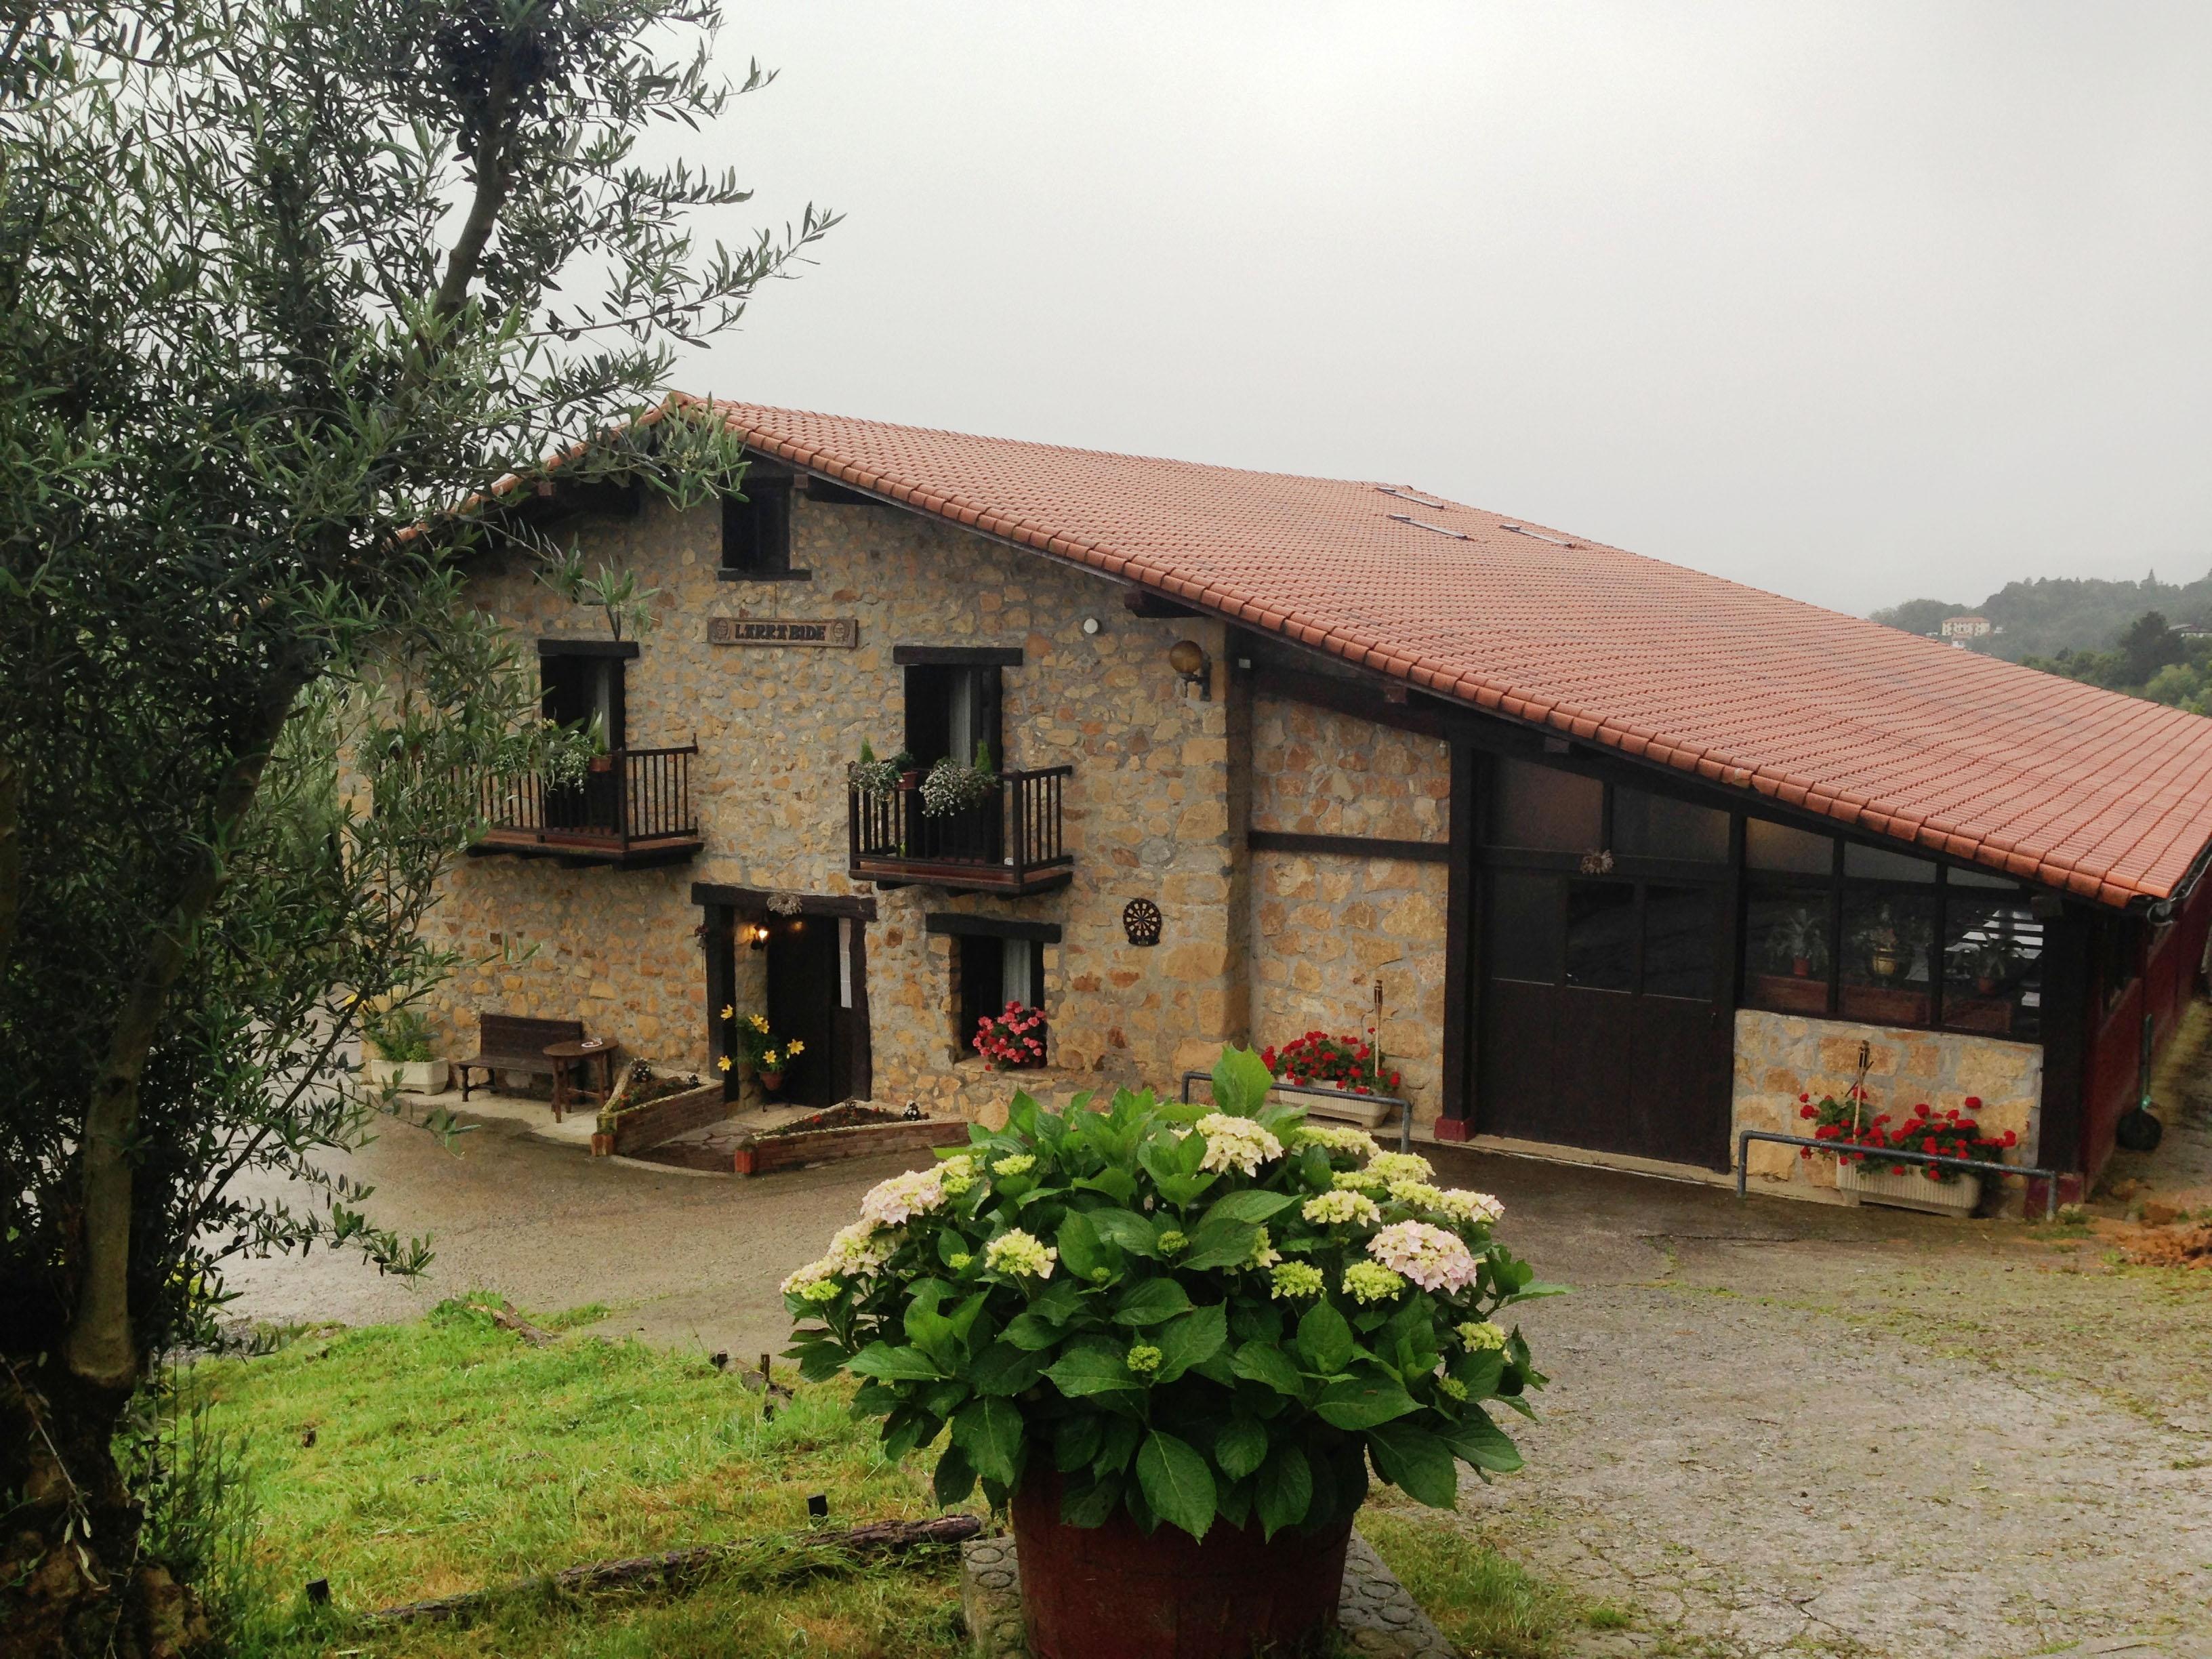 Holiday House Larrabide in Donostia-San Sebastián, Spain ES9320.100.1  Interhome